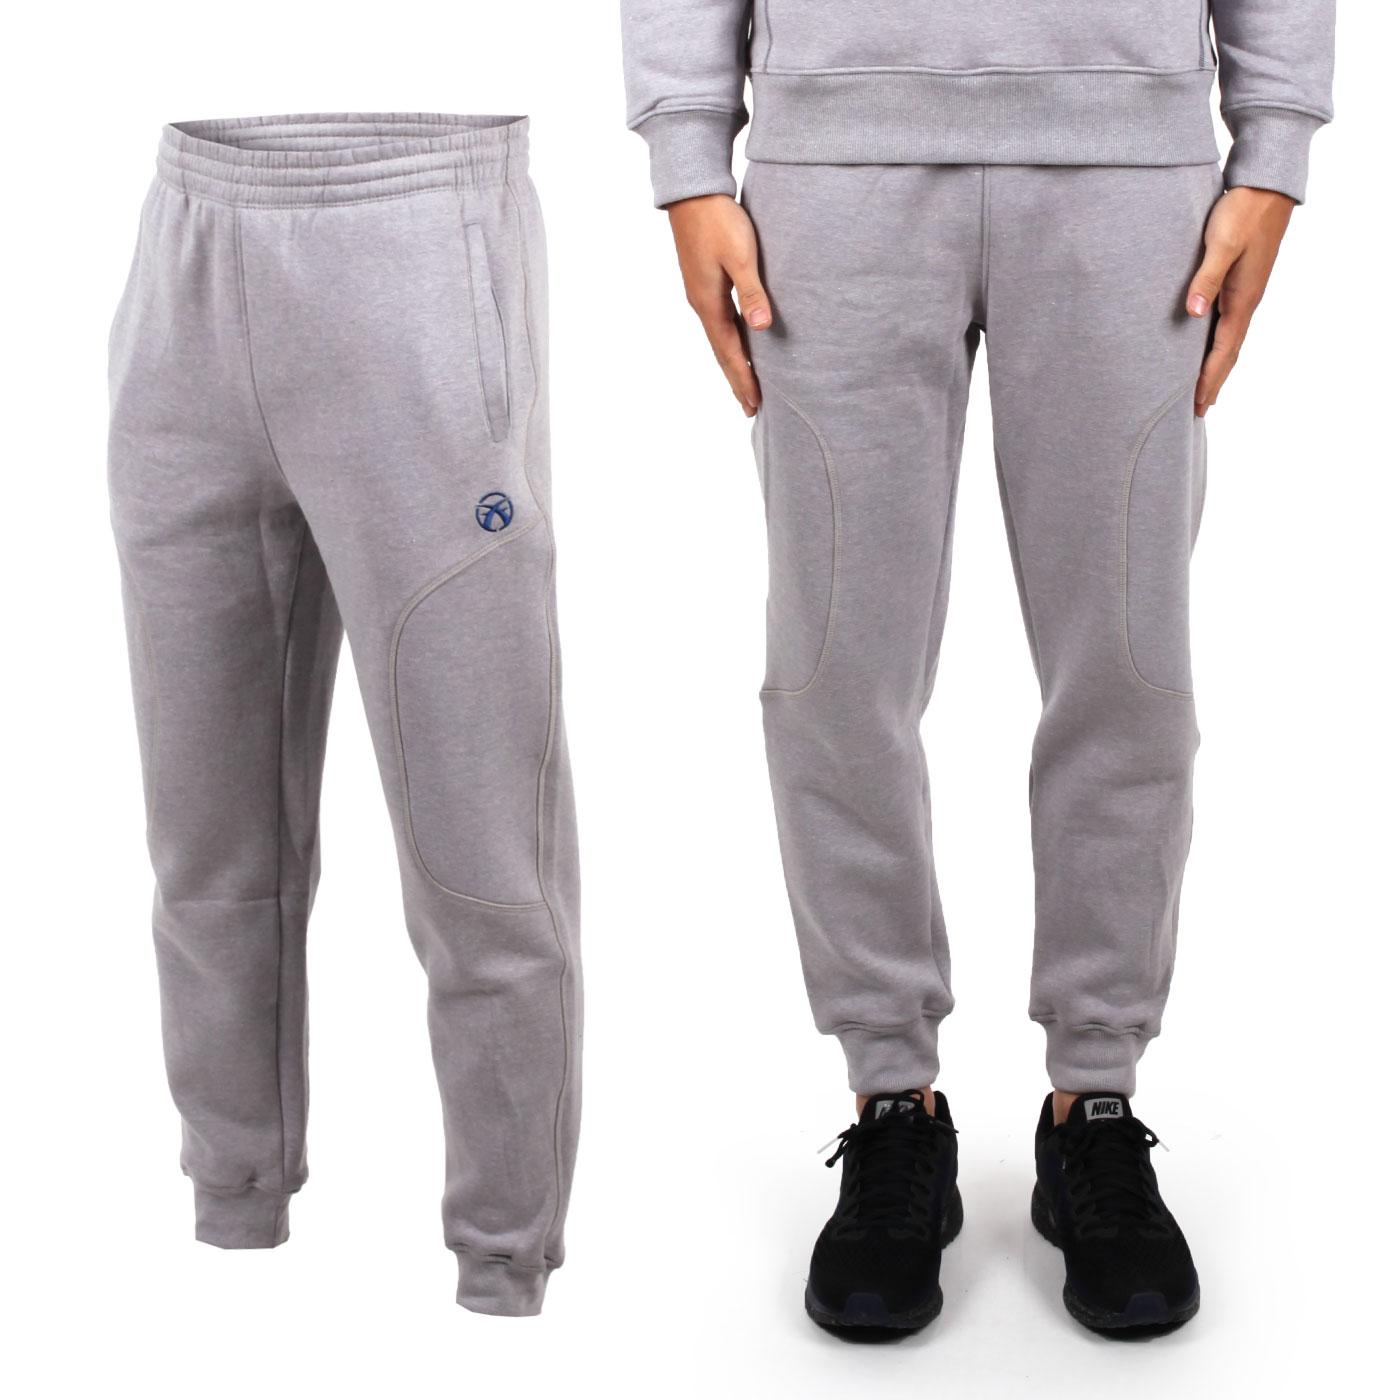 FIRESTAR 男高磅厚棉長褲 P6577-10 - 淺灰藍